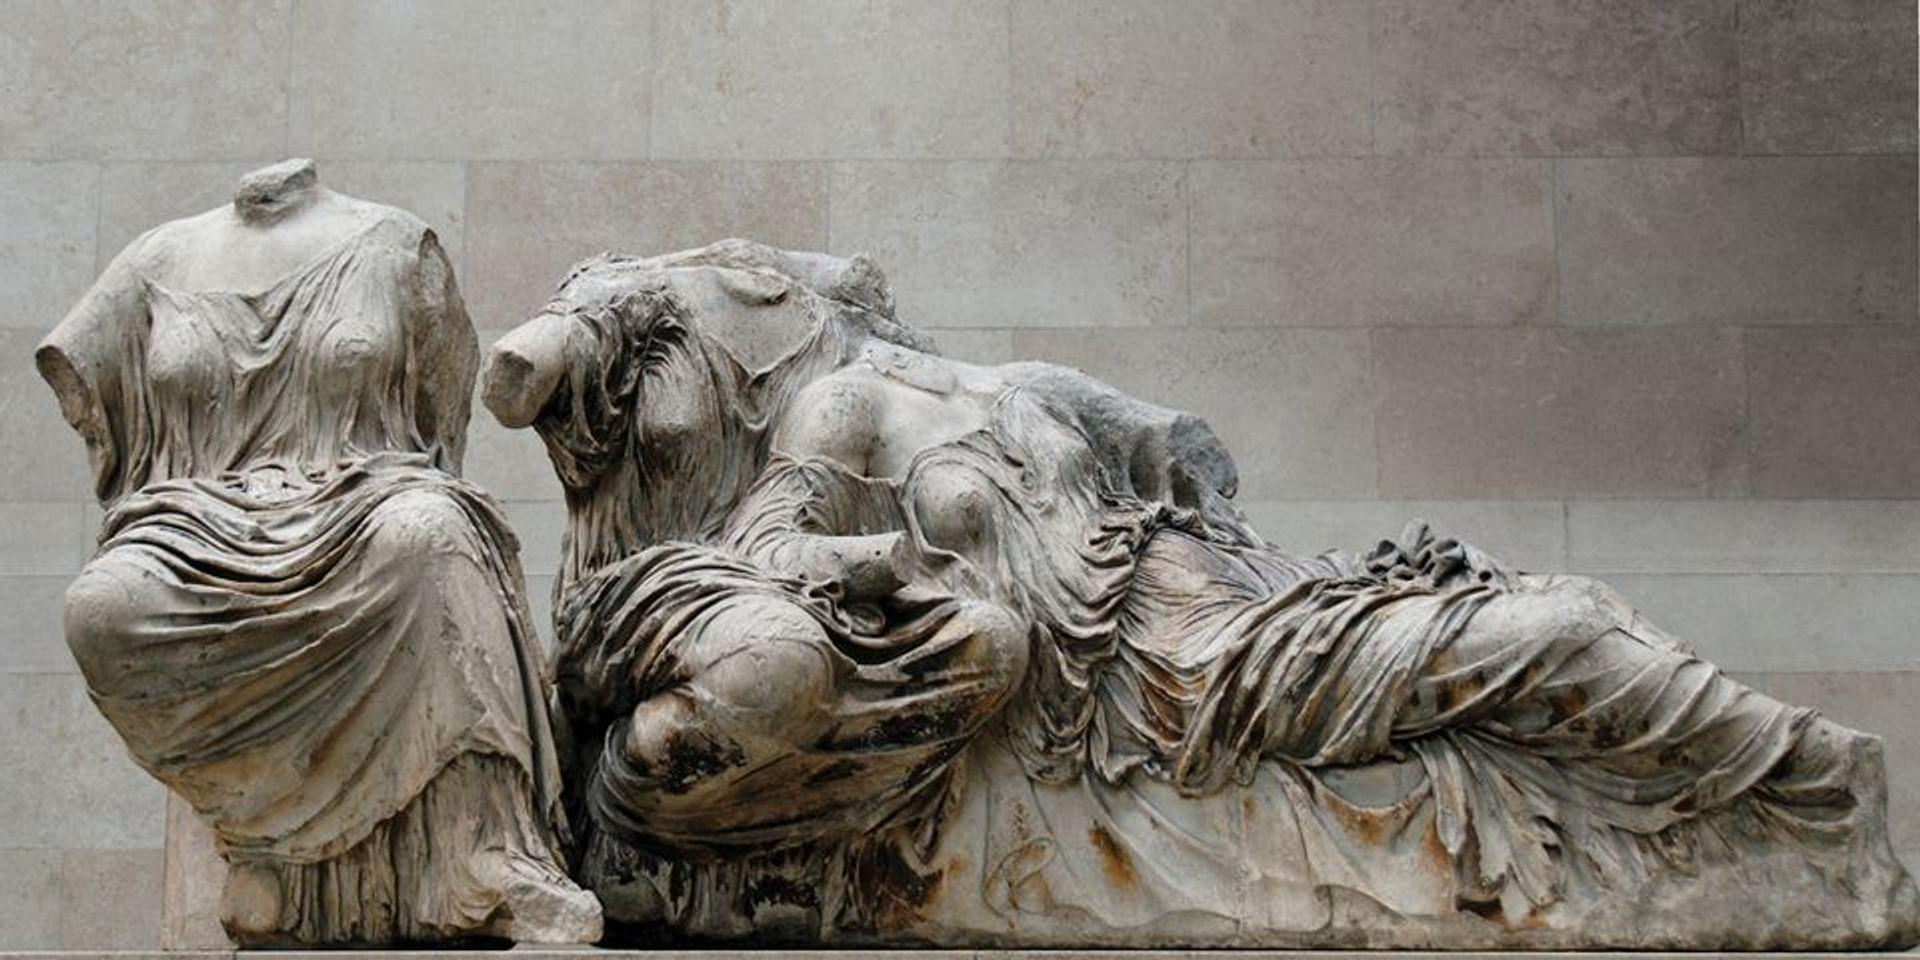 Parthenon sculptures in the British Museum © Marie-Lan Nguyen